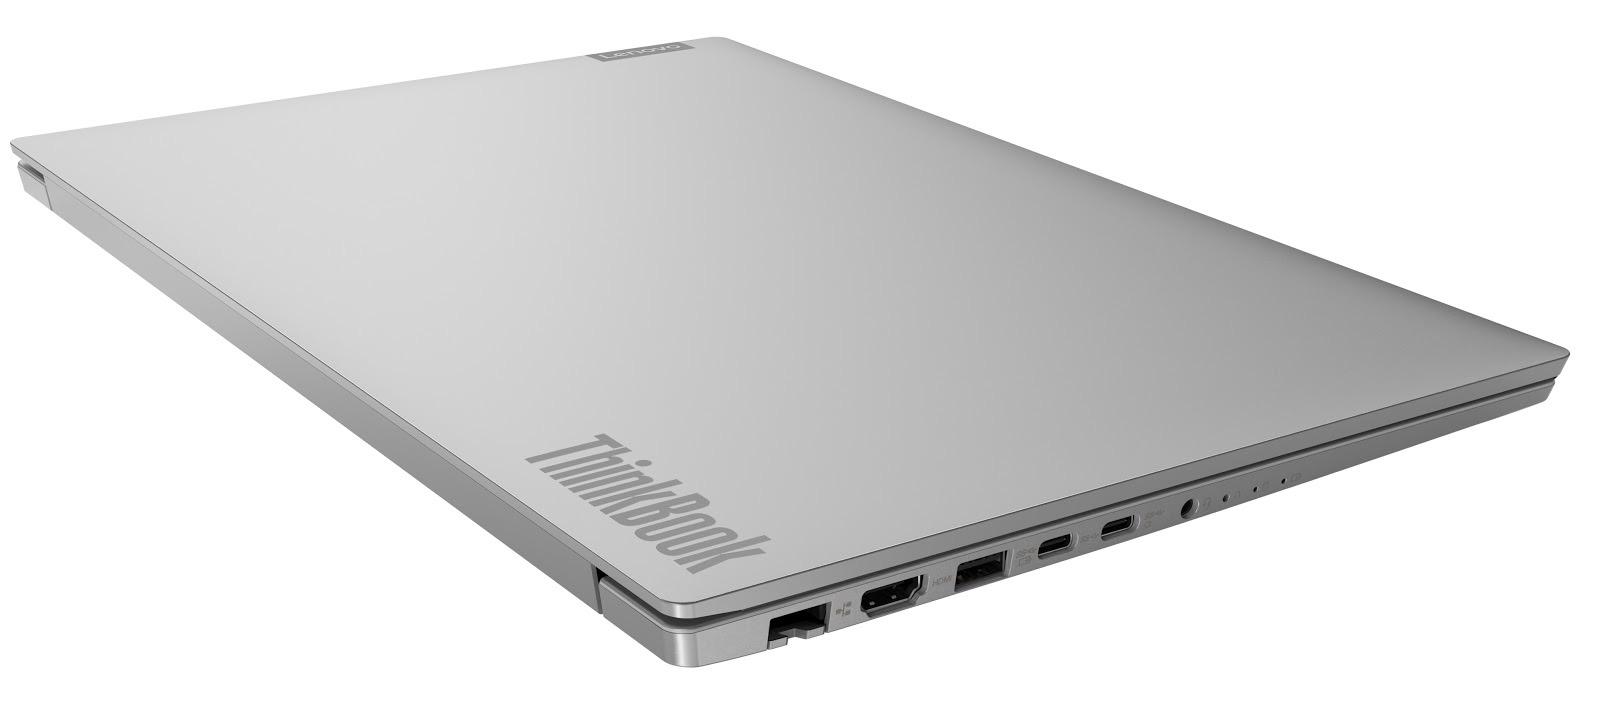 Фото 3. Ноутбук Lenovo ThinkBook 15-IIL (20SM002LRU)